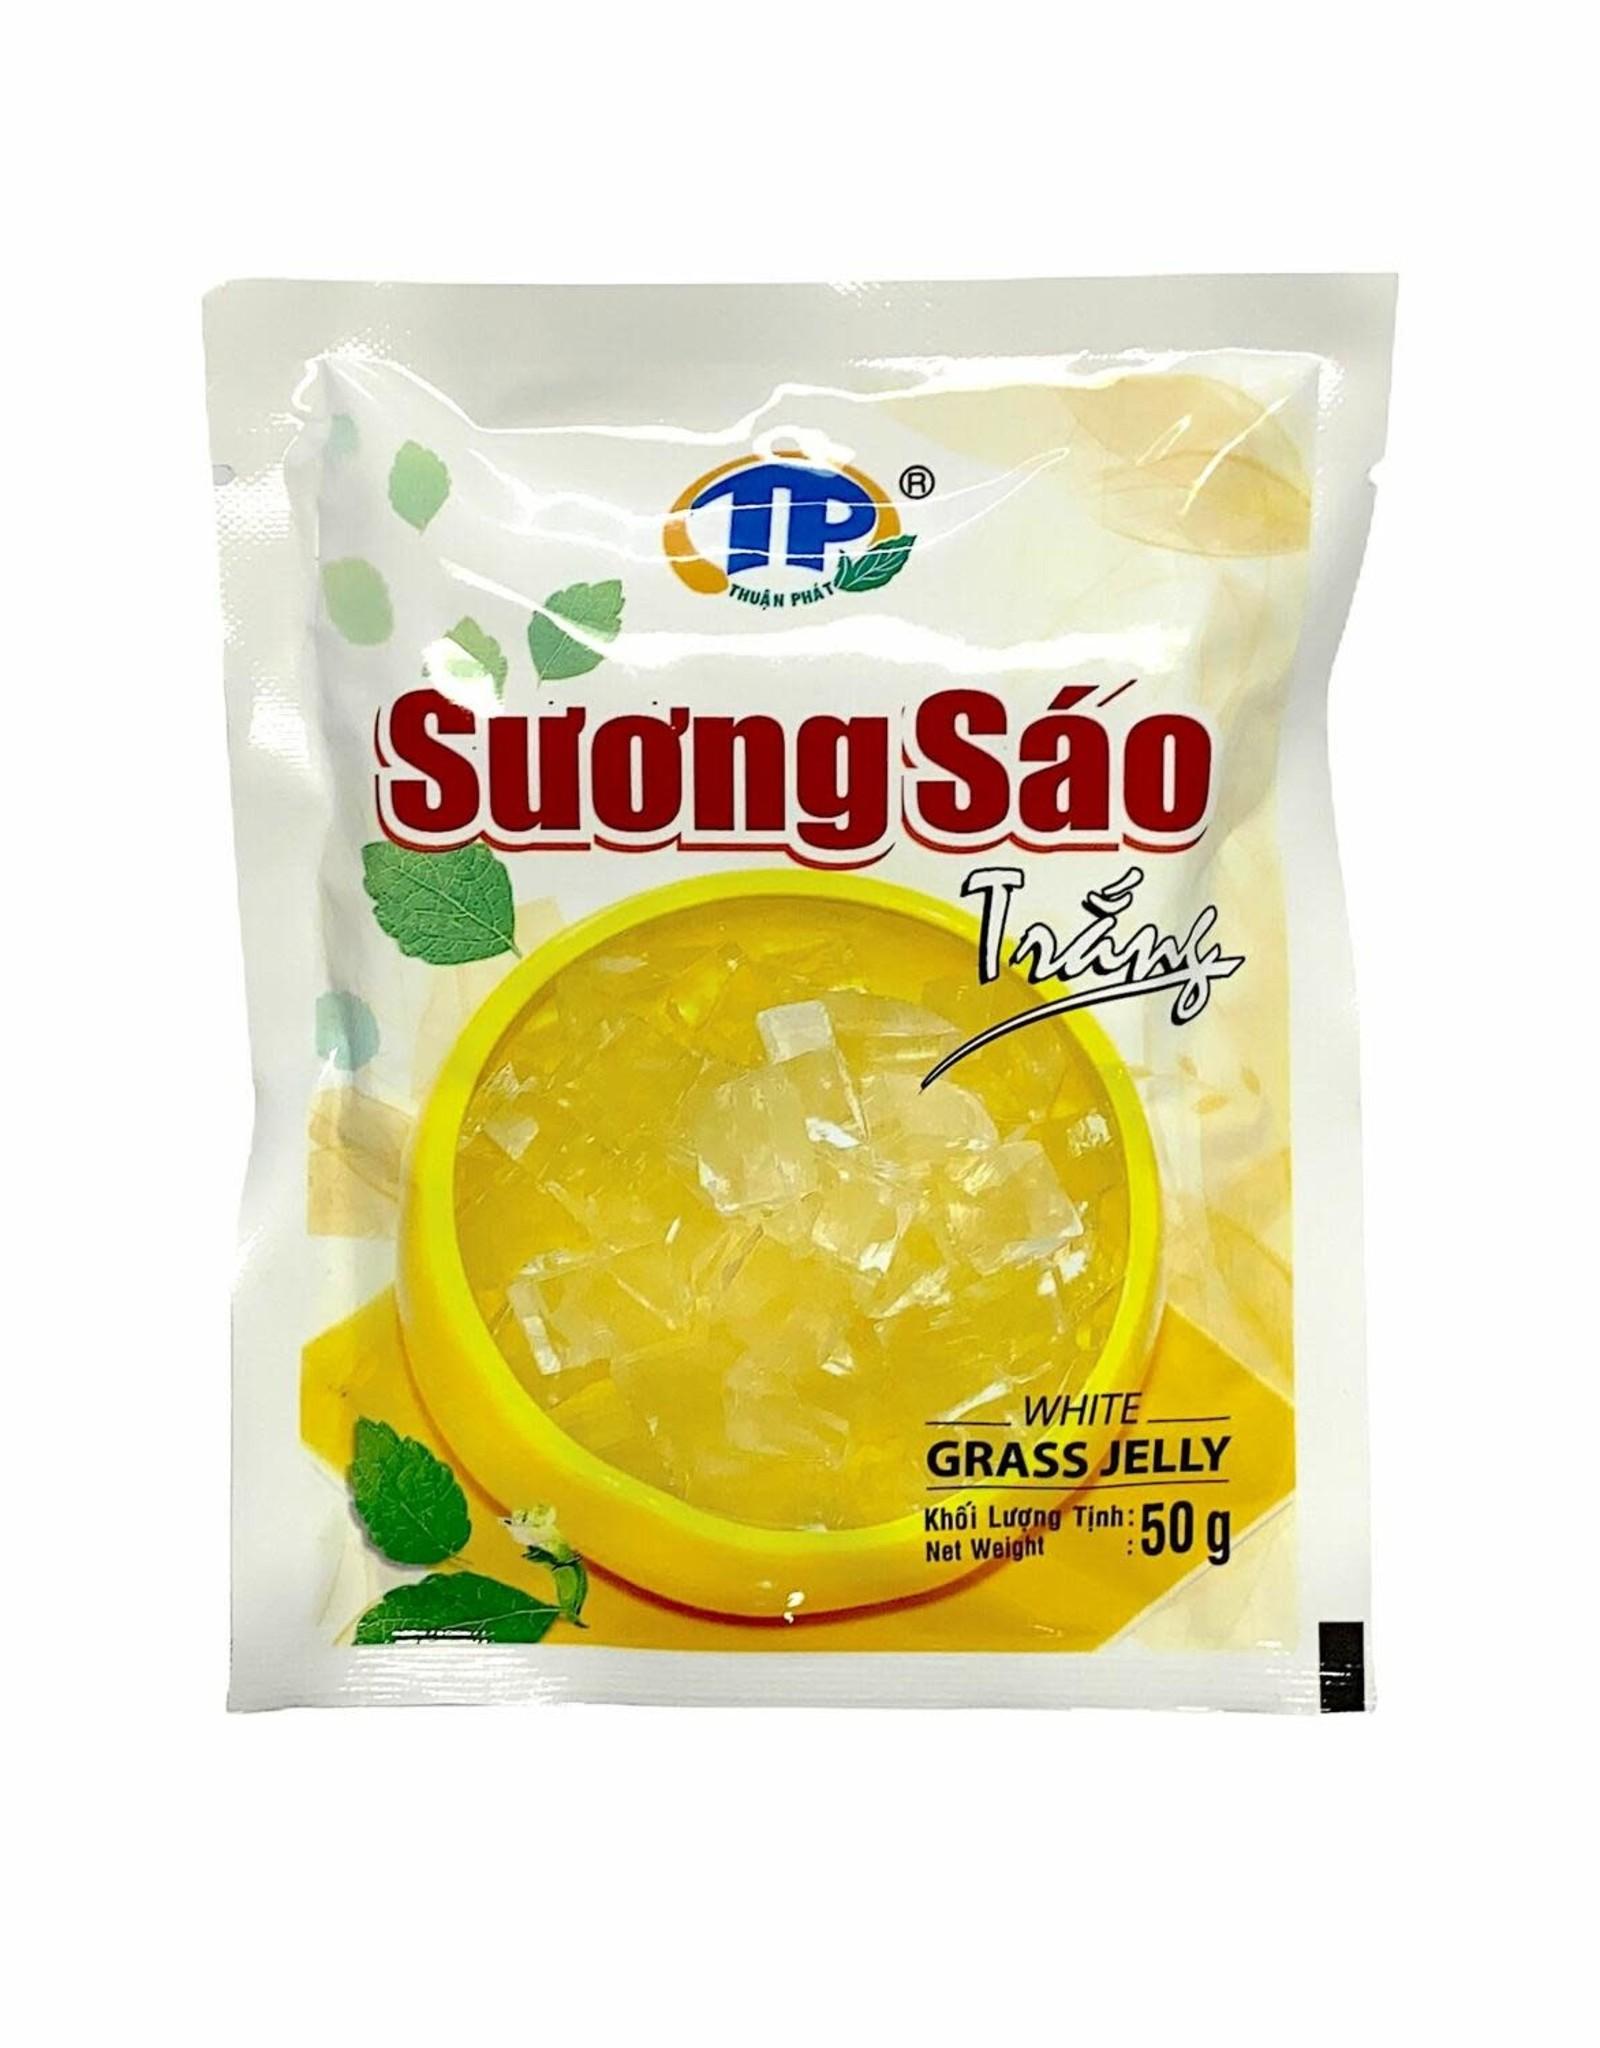 Thuan Phat Grass Jelly Powder WHITE/Suong Sao Trang 50g